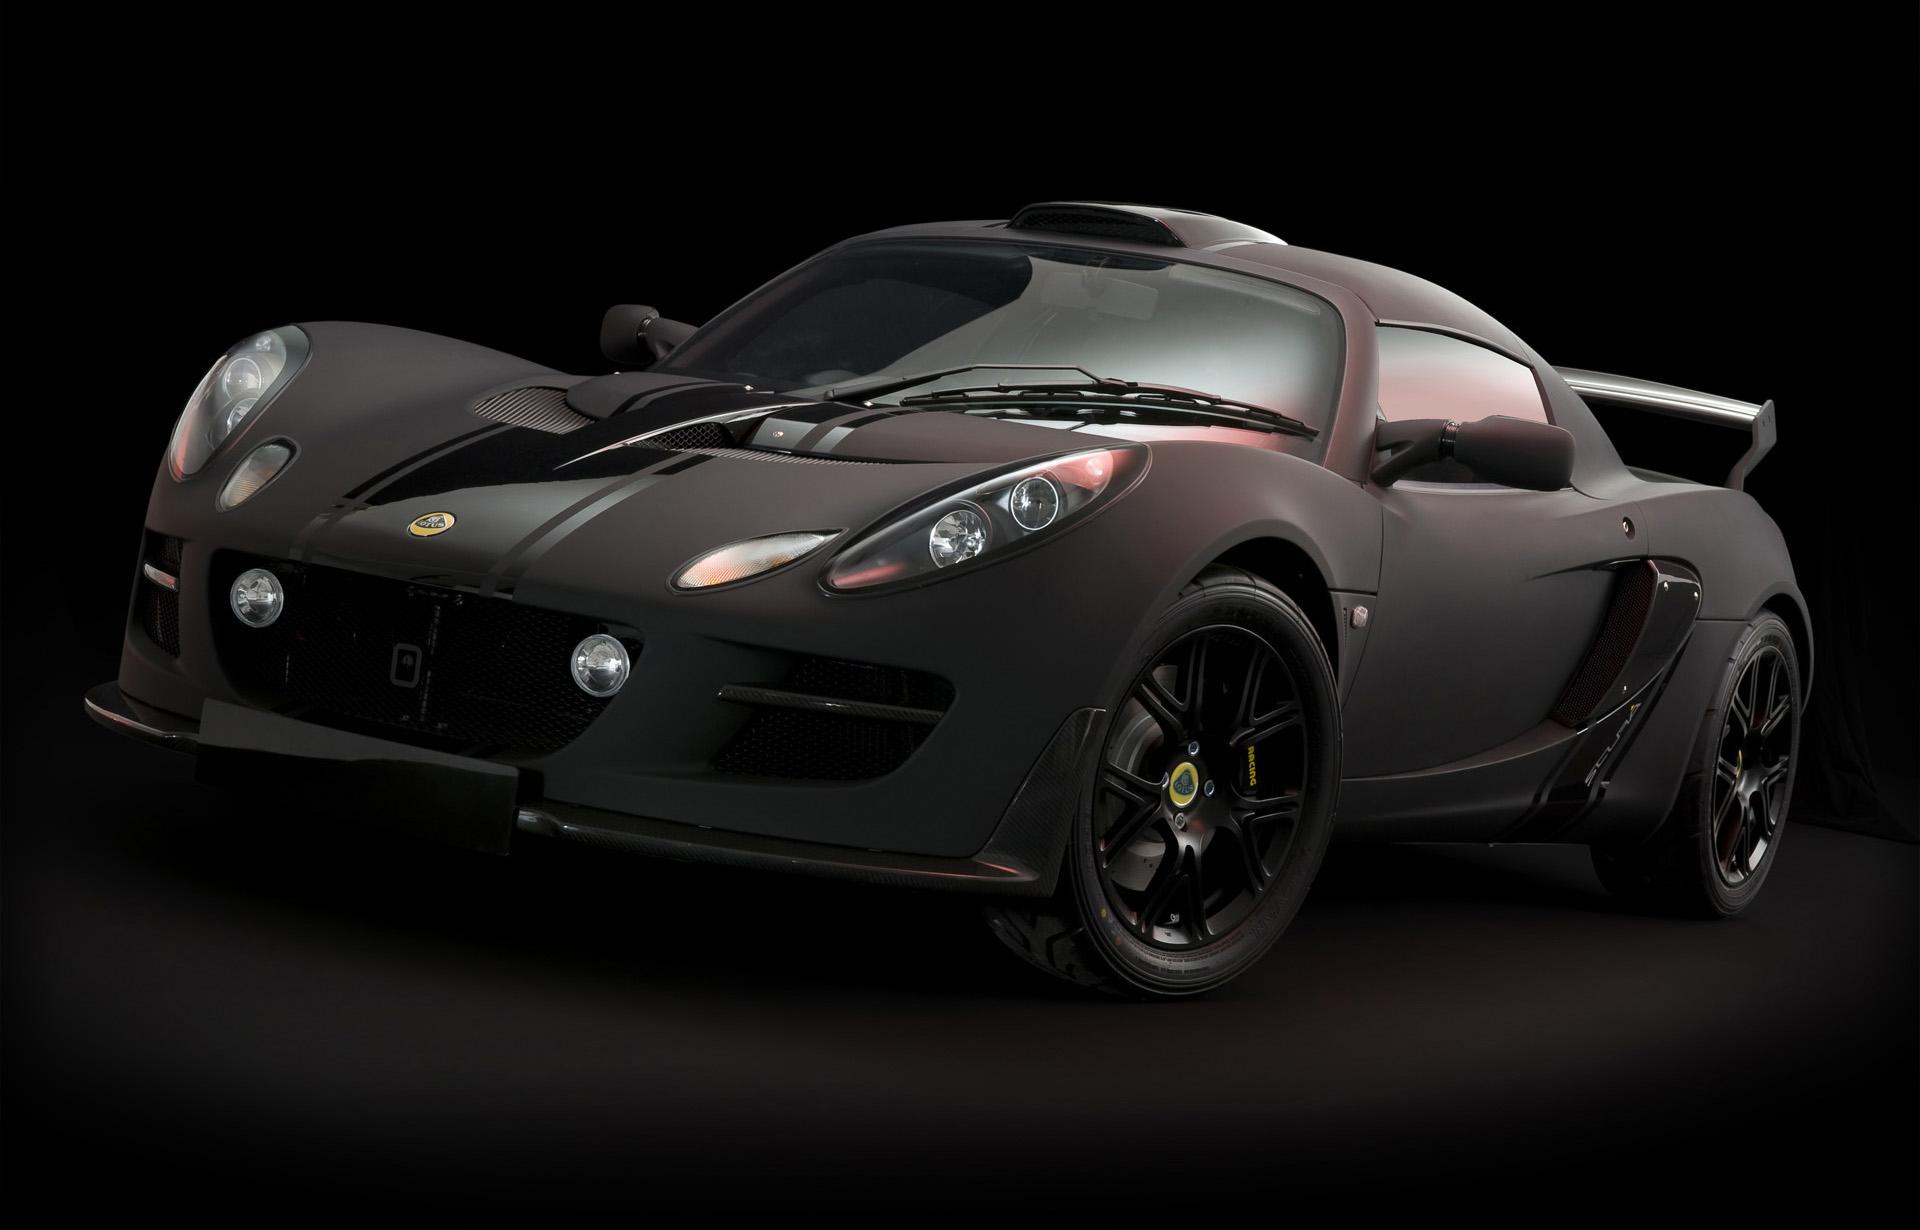 Lotus Exige Matte Black Final Edition photo #1